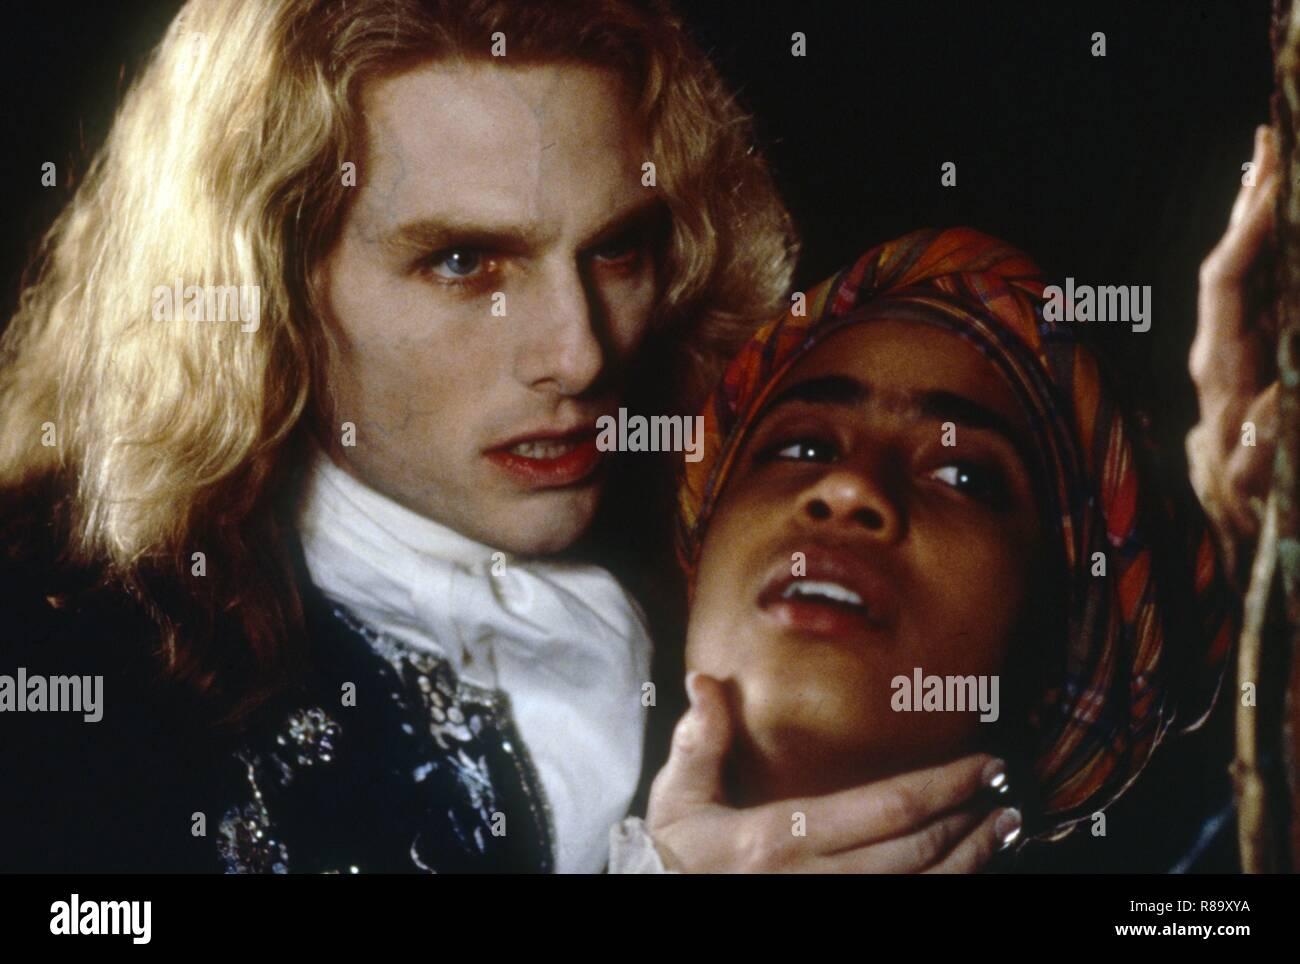 Interview With The Vampire The Vampire Chronicles Year 1994 Usa Director Neil Jordan Tom Cruise Thandie Newton Stock Photo Alamy